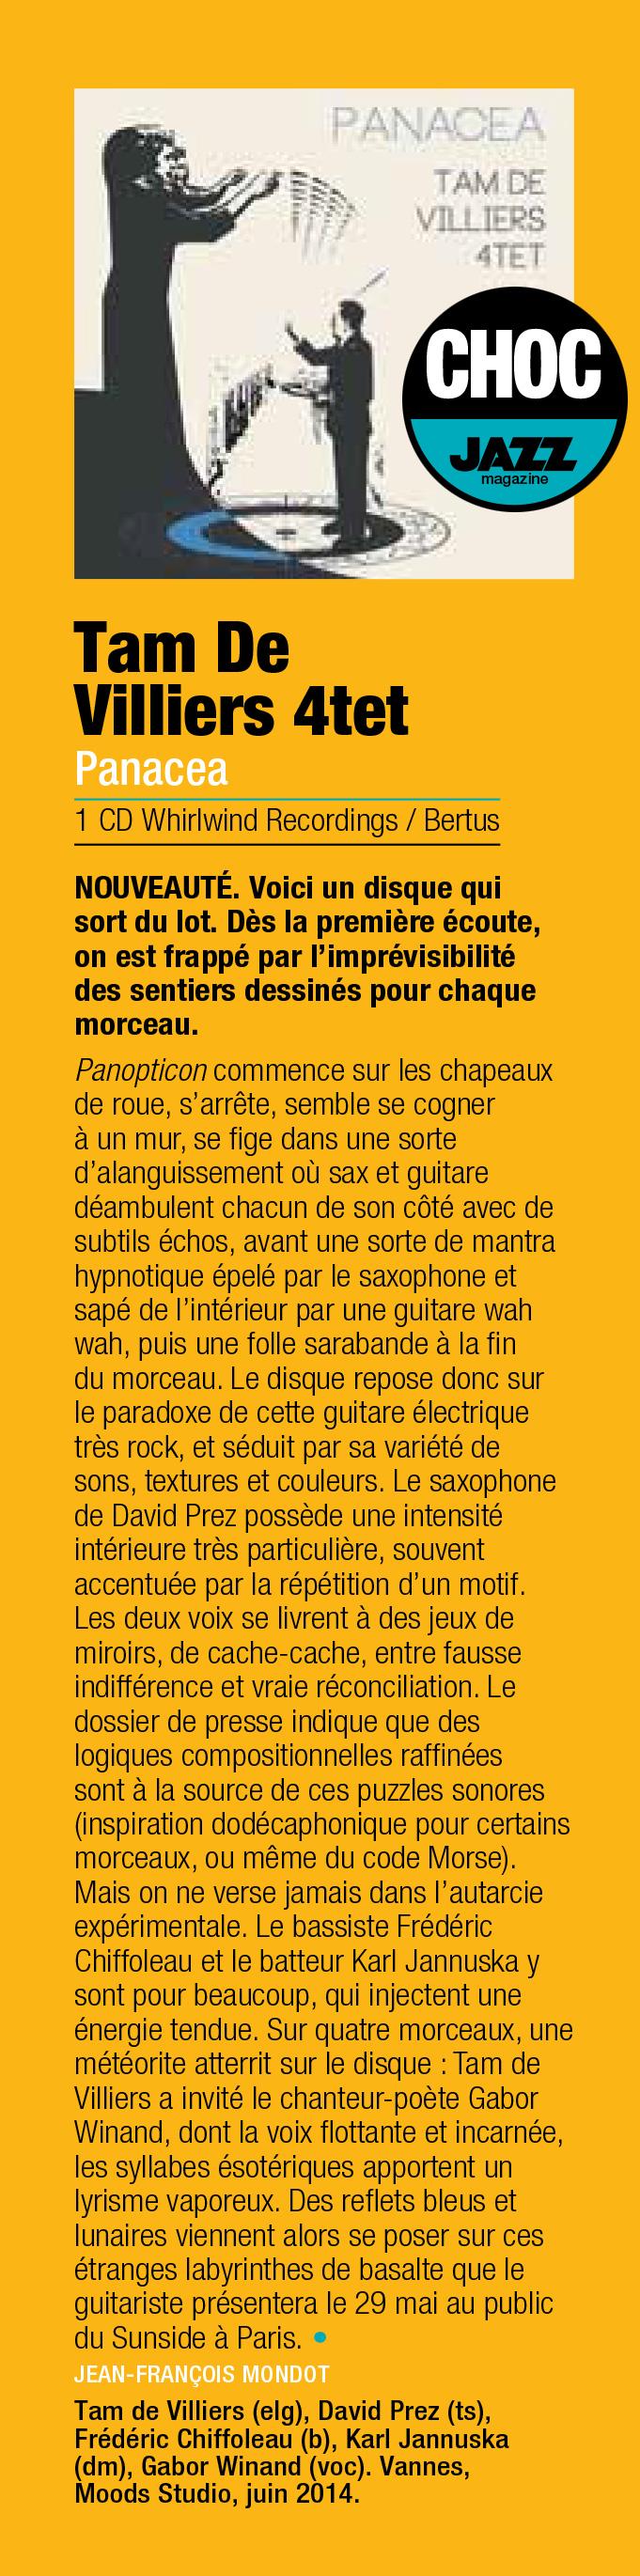 CHOC-Jazzmagazine-Panacea-Tam-de-Villiers-4tet web